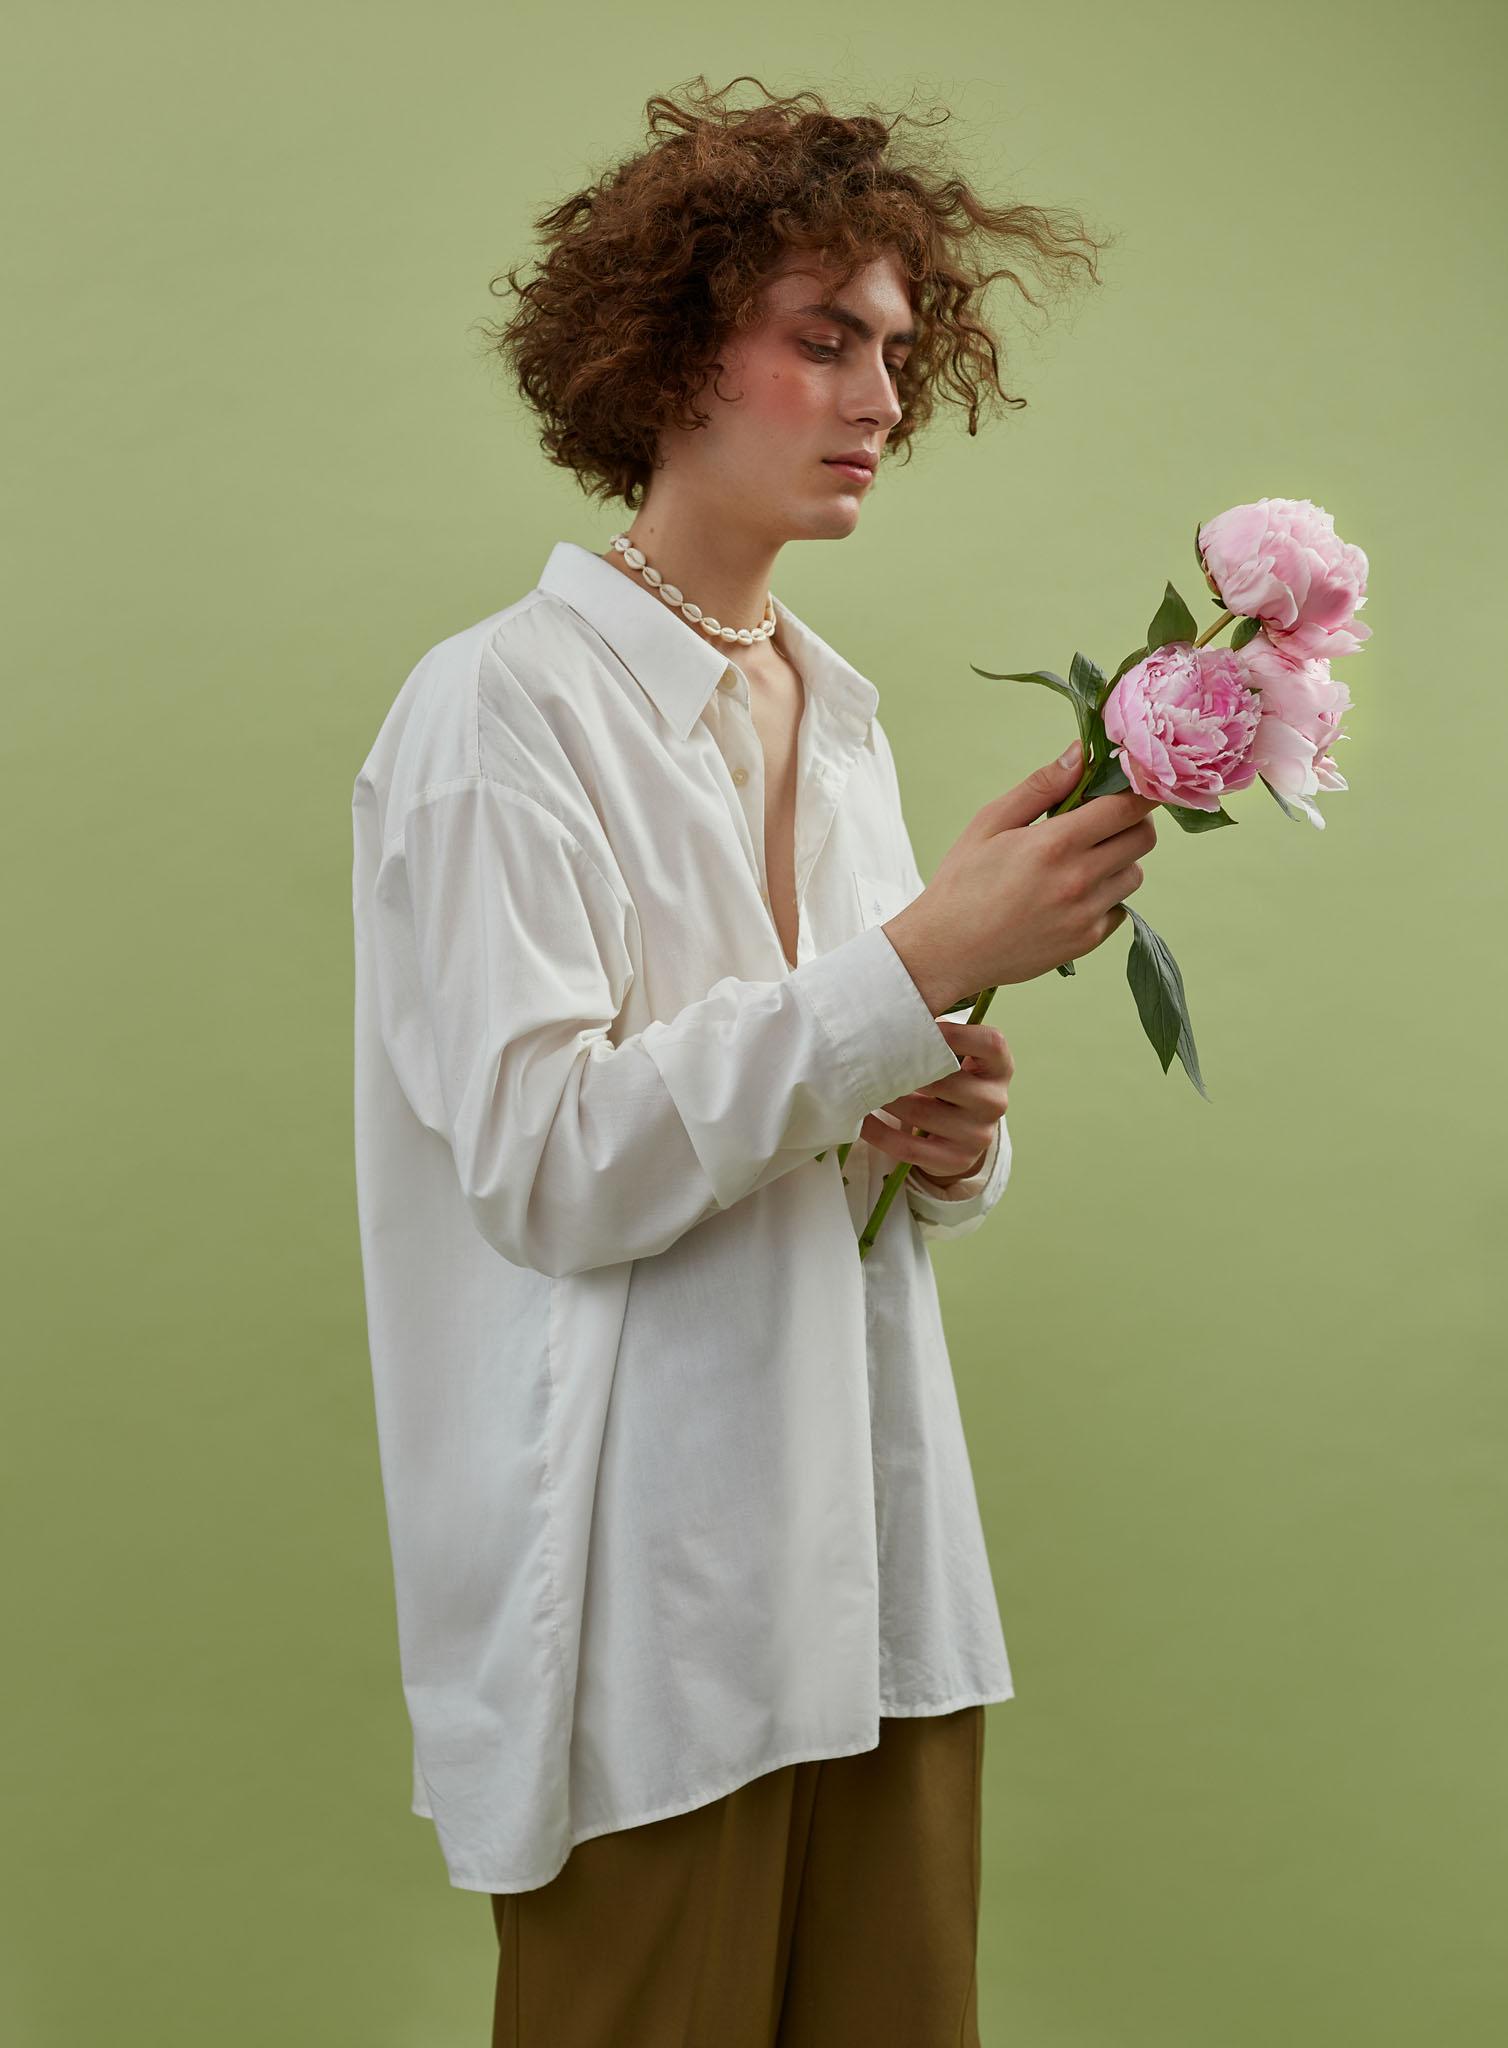 003_a_flower_in_your_pocket_evgeniy_sorbo.jpg